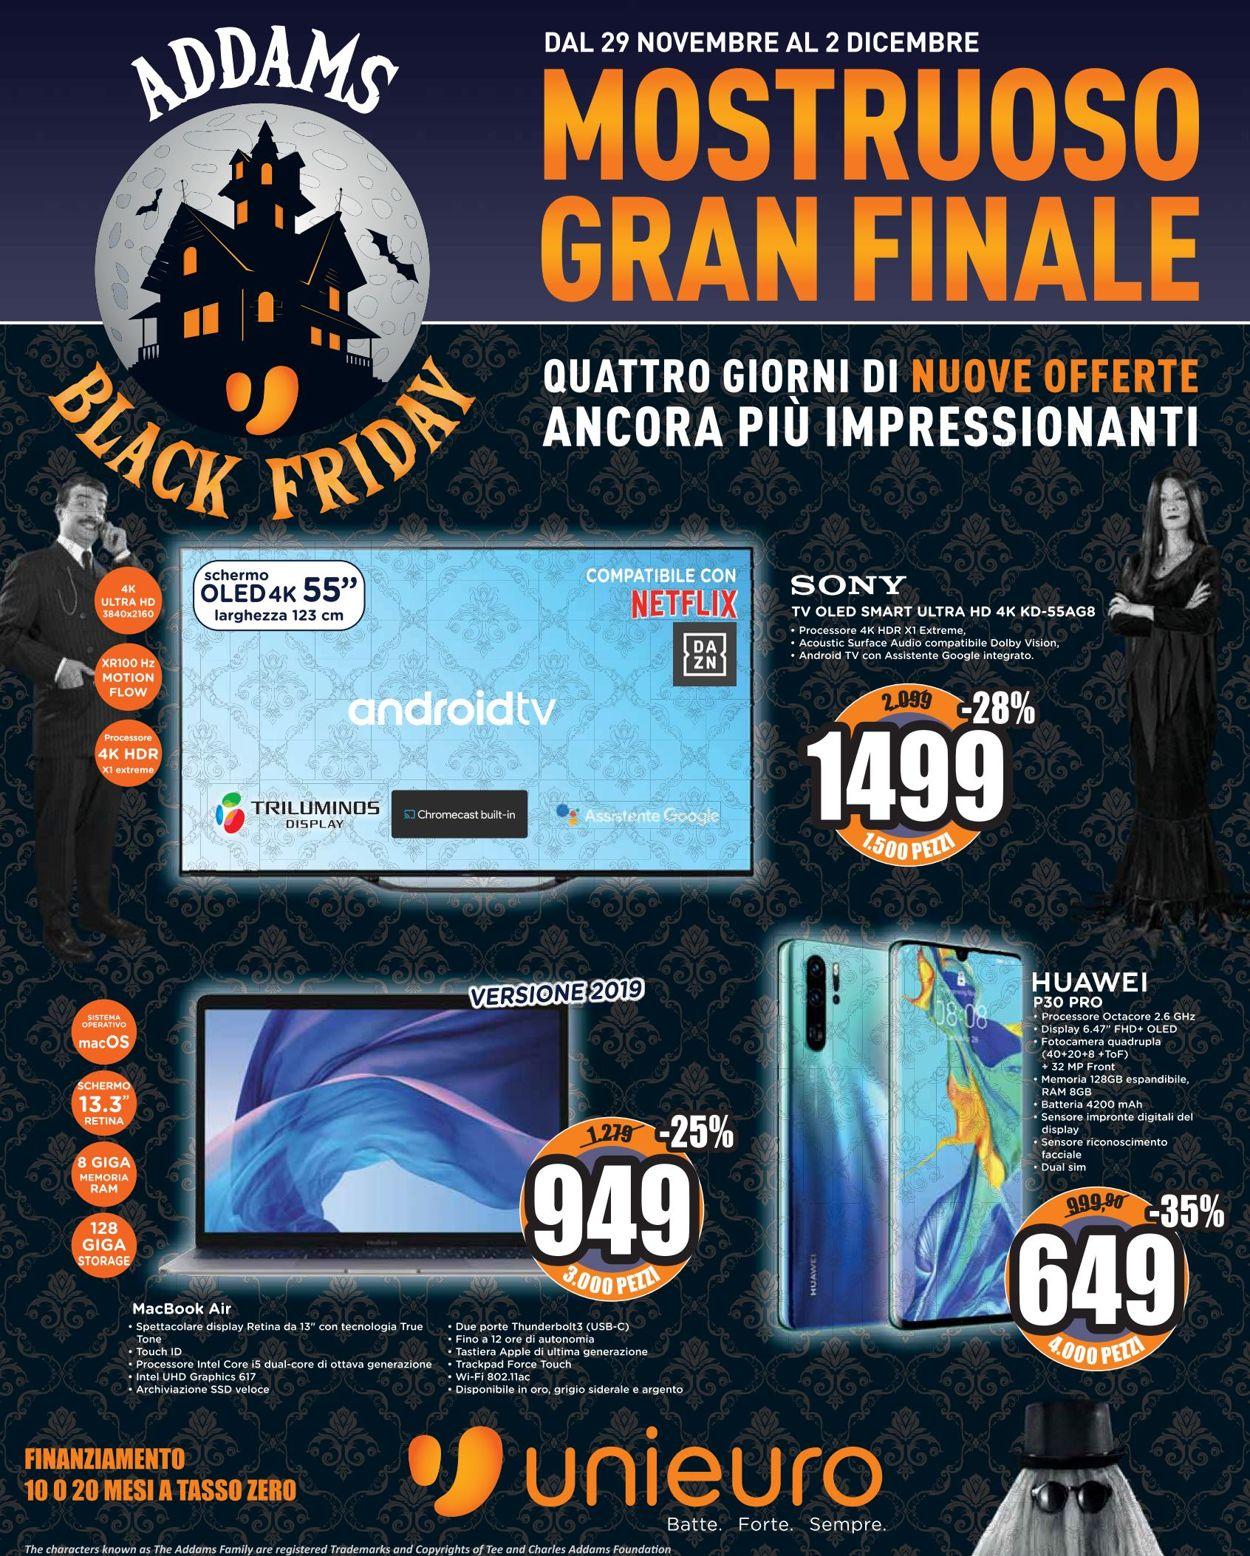 Volantino Unieuro - BLACK FRIDAY 2019 - Offerte 29/11-02/12/2019